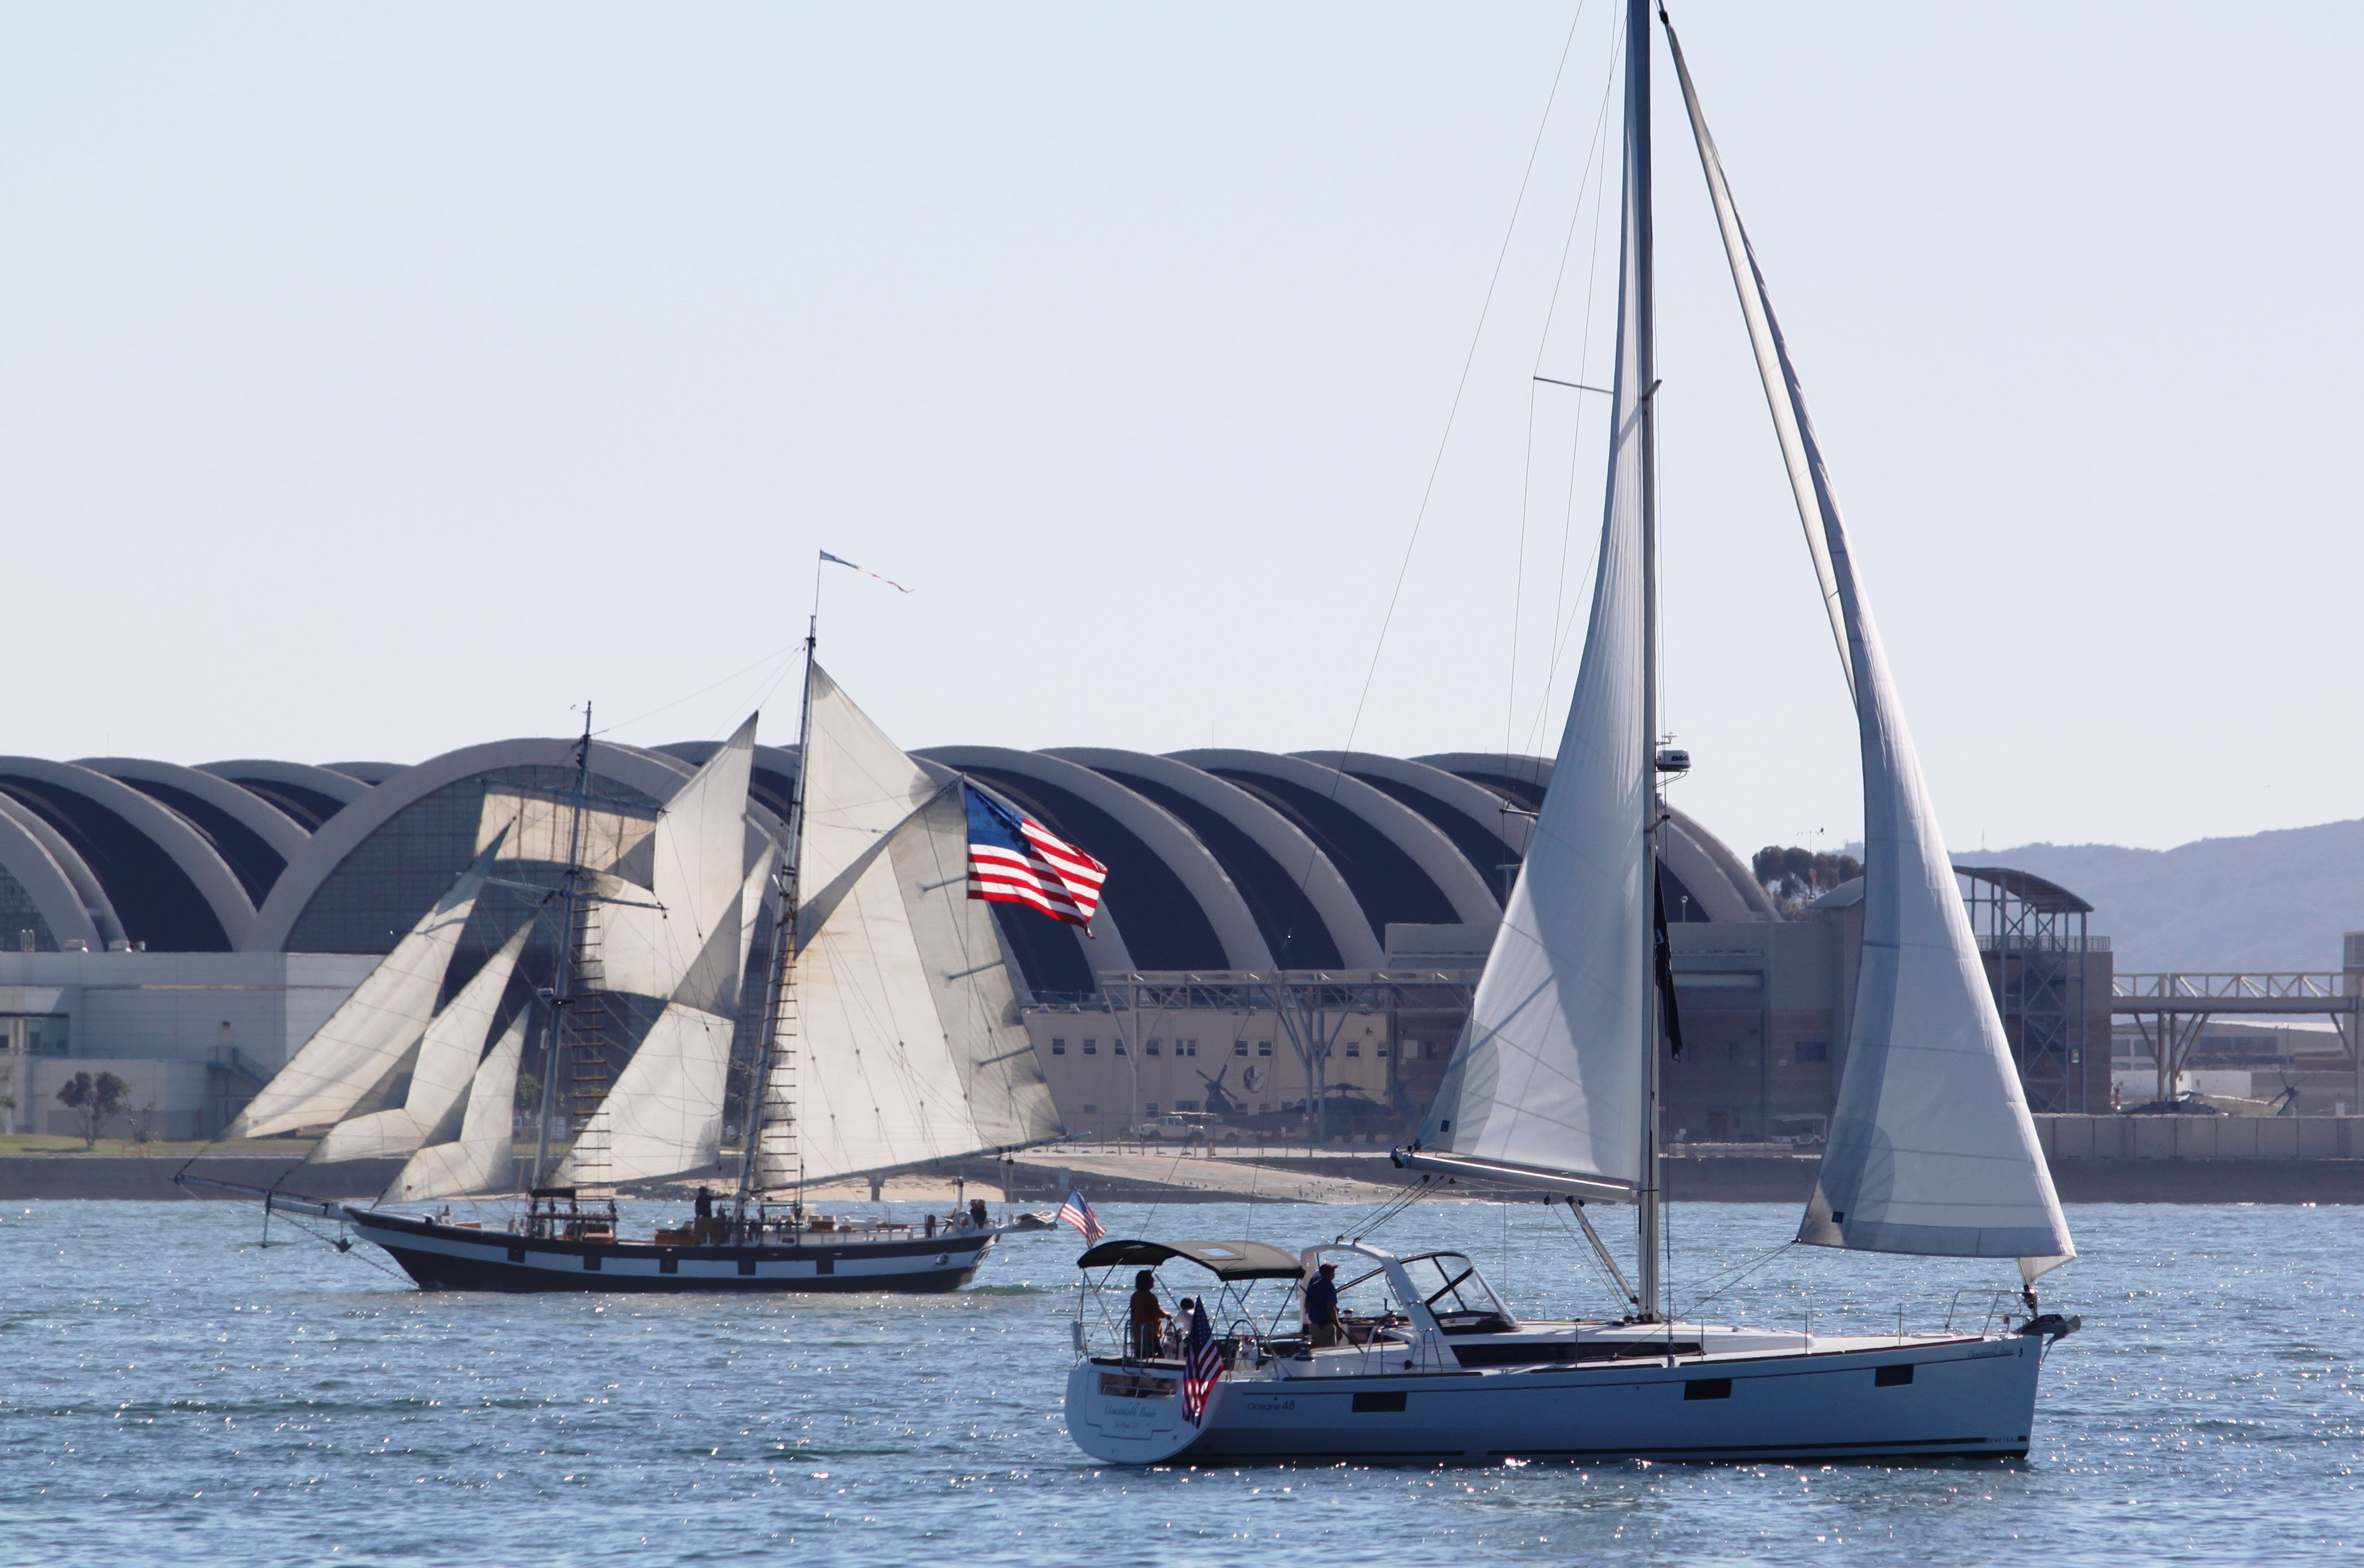 Beneteau Oceanis 48 And Classic Schooner Amazing Grace Sailboats